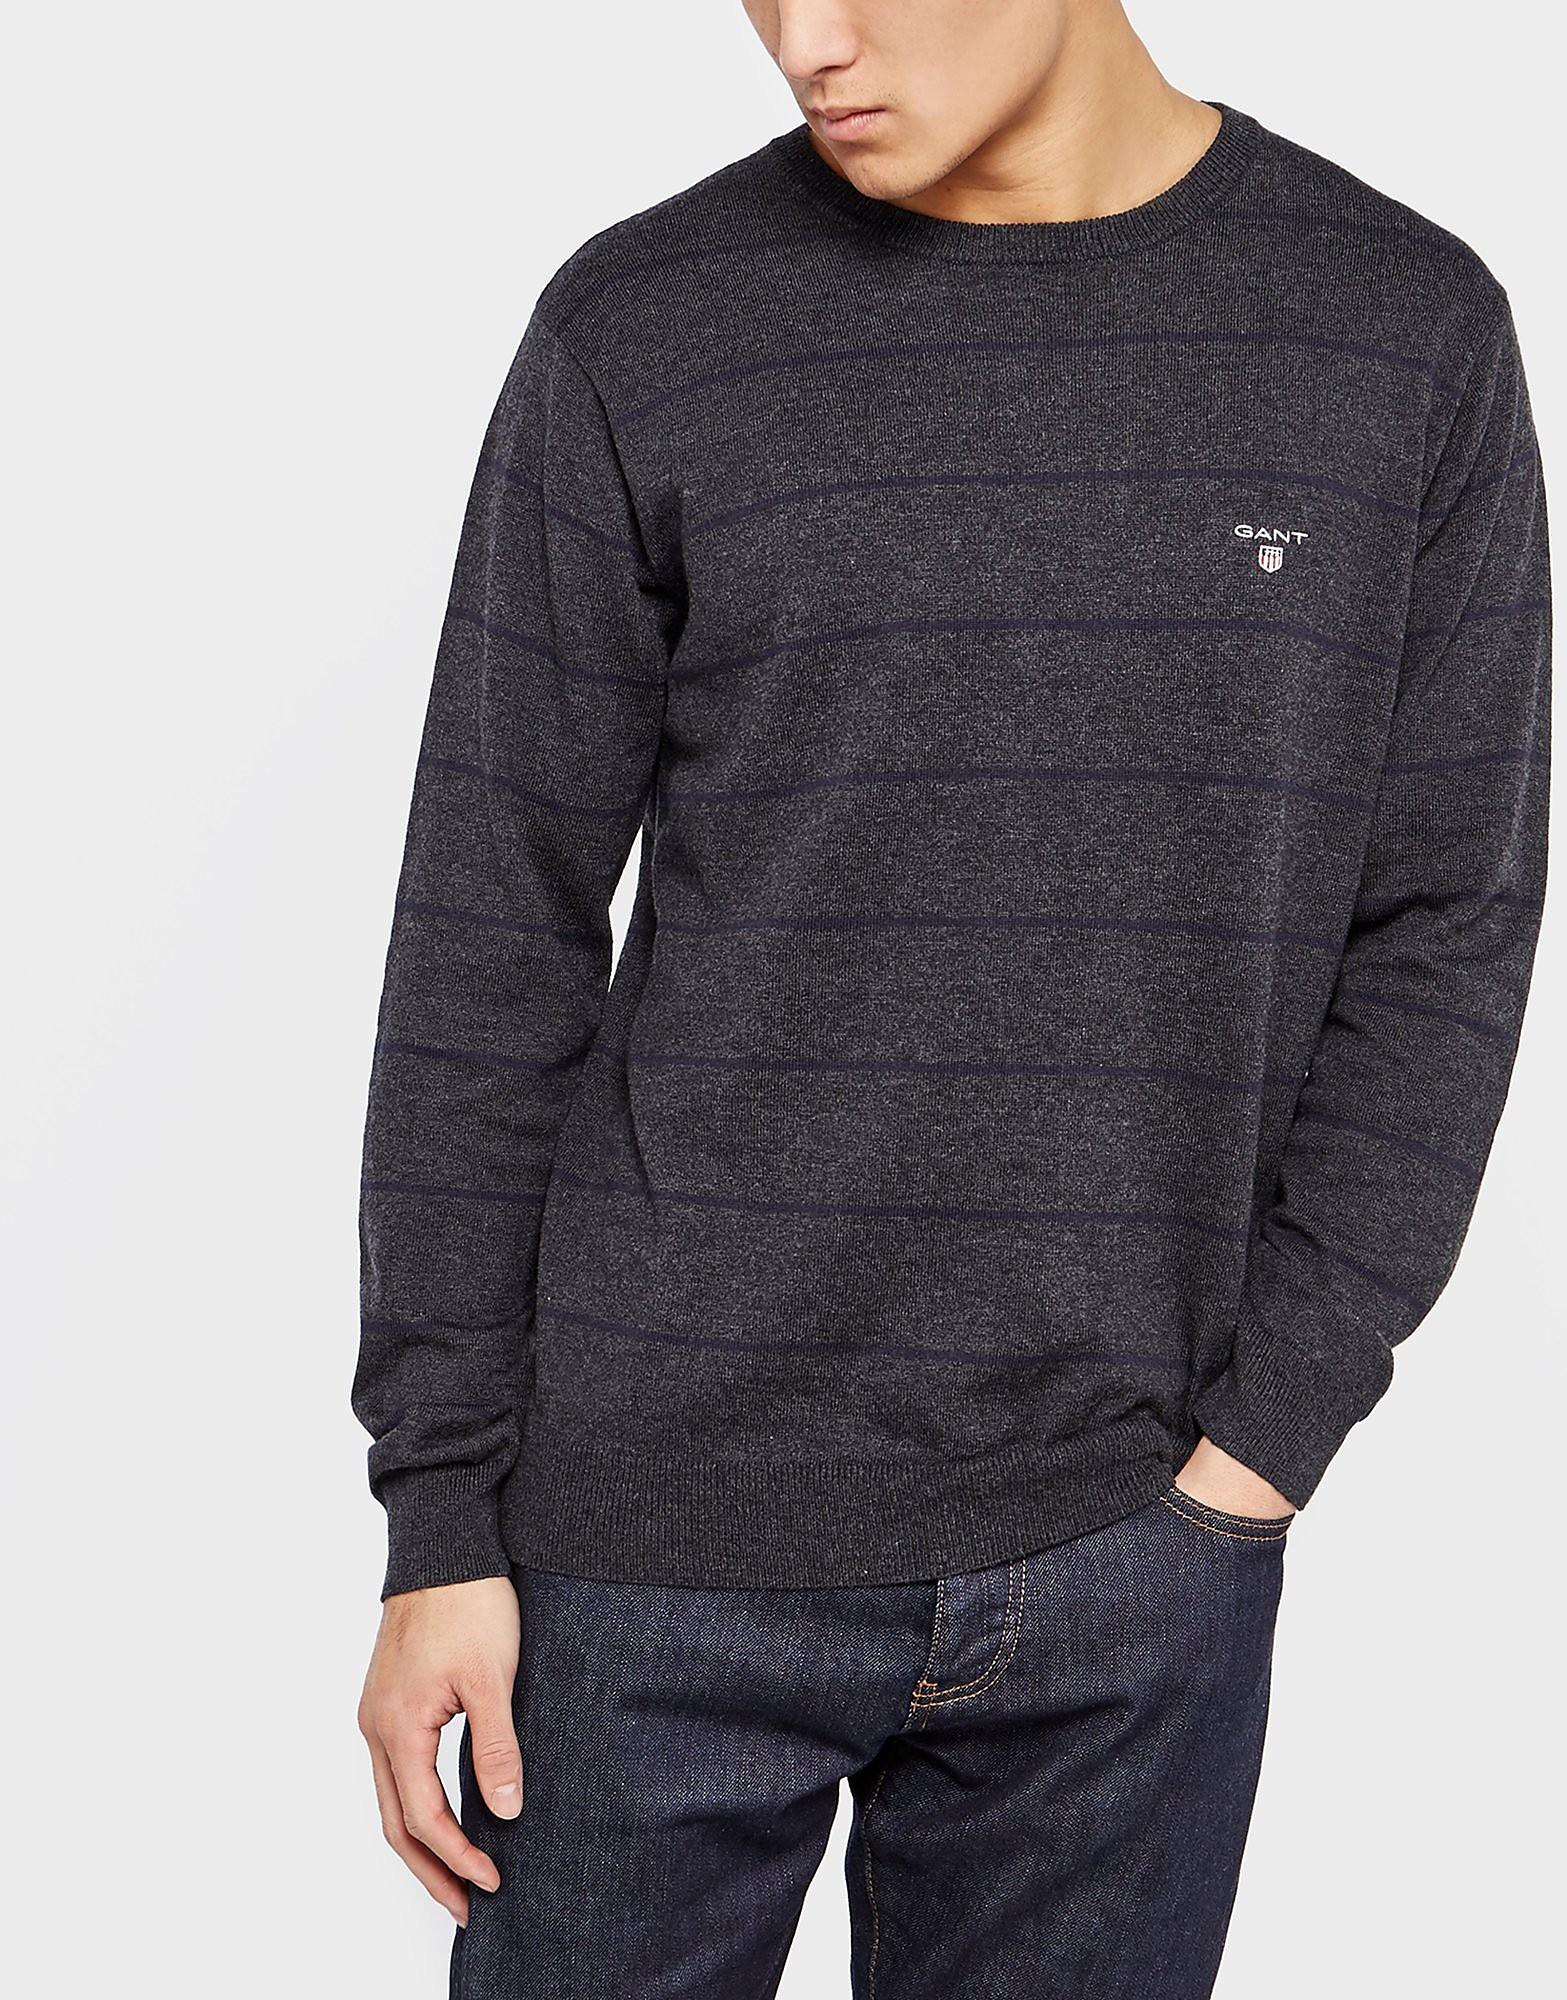 GANT Breton Crew Sweatshirt